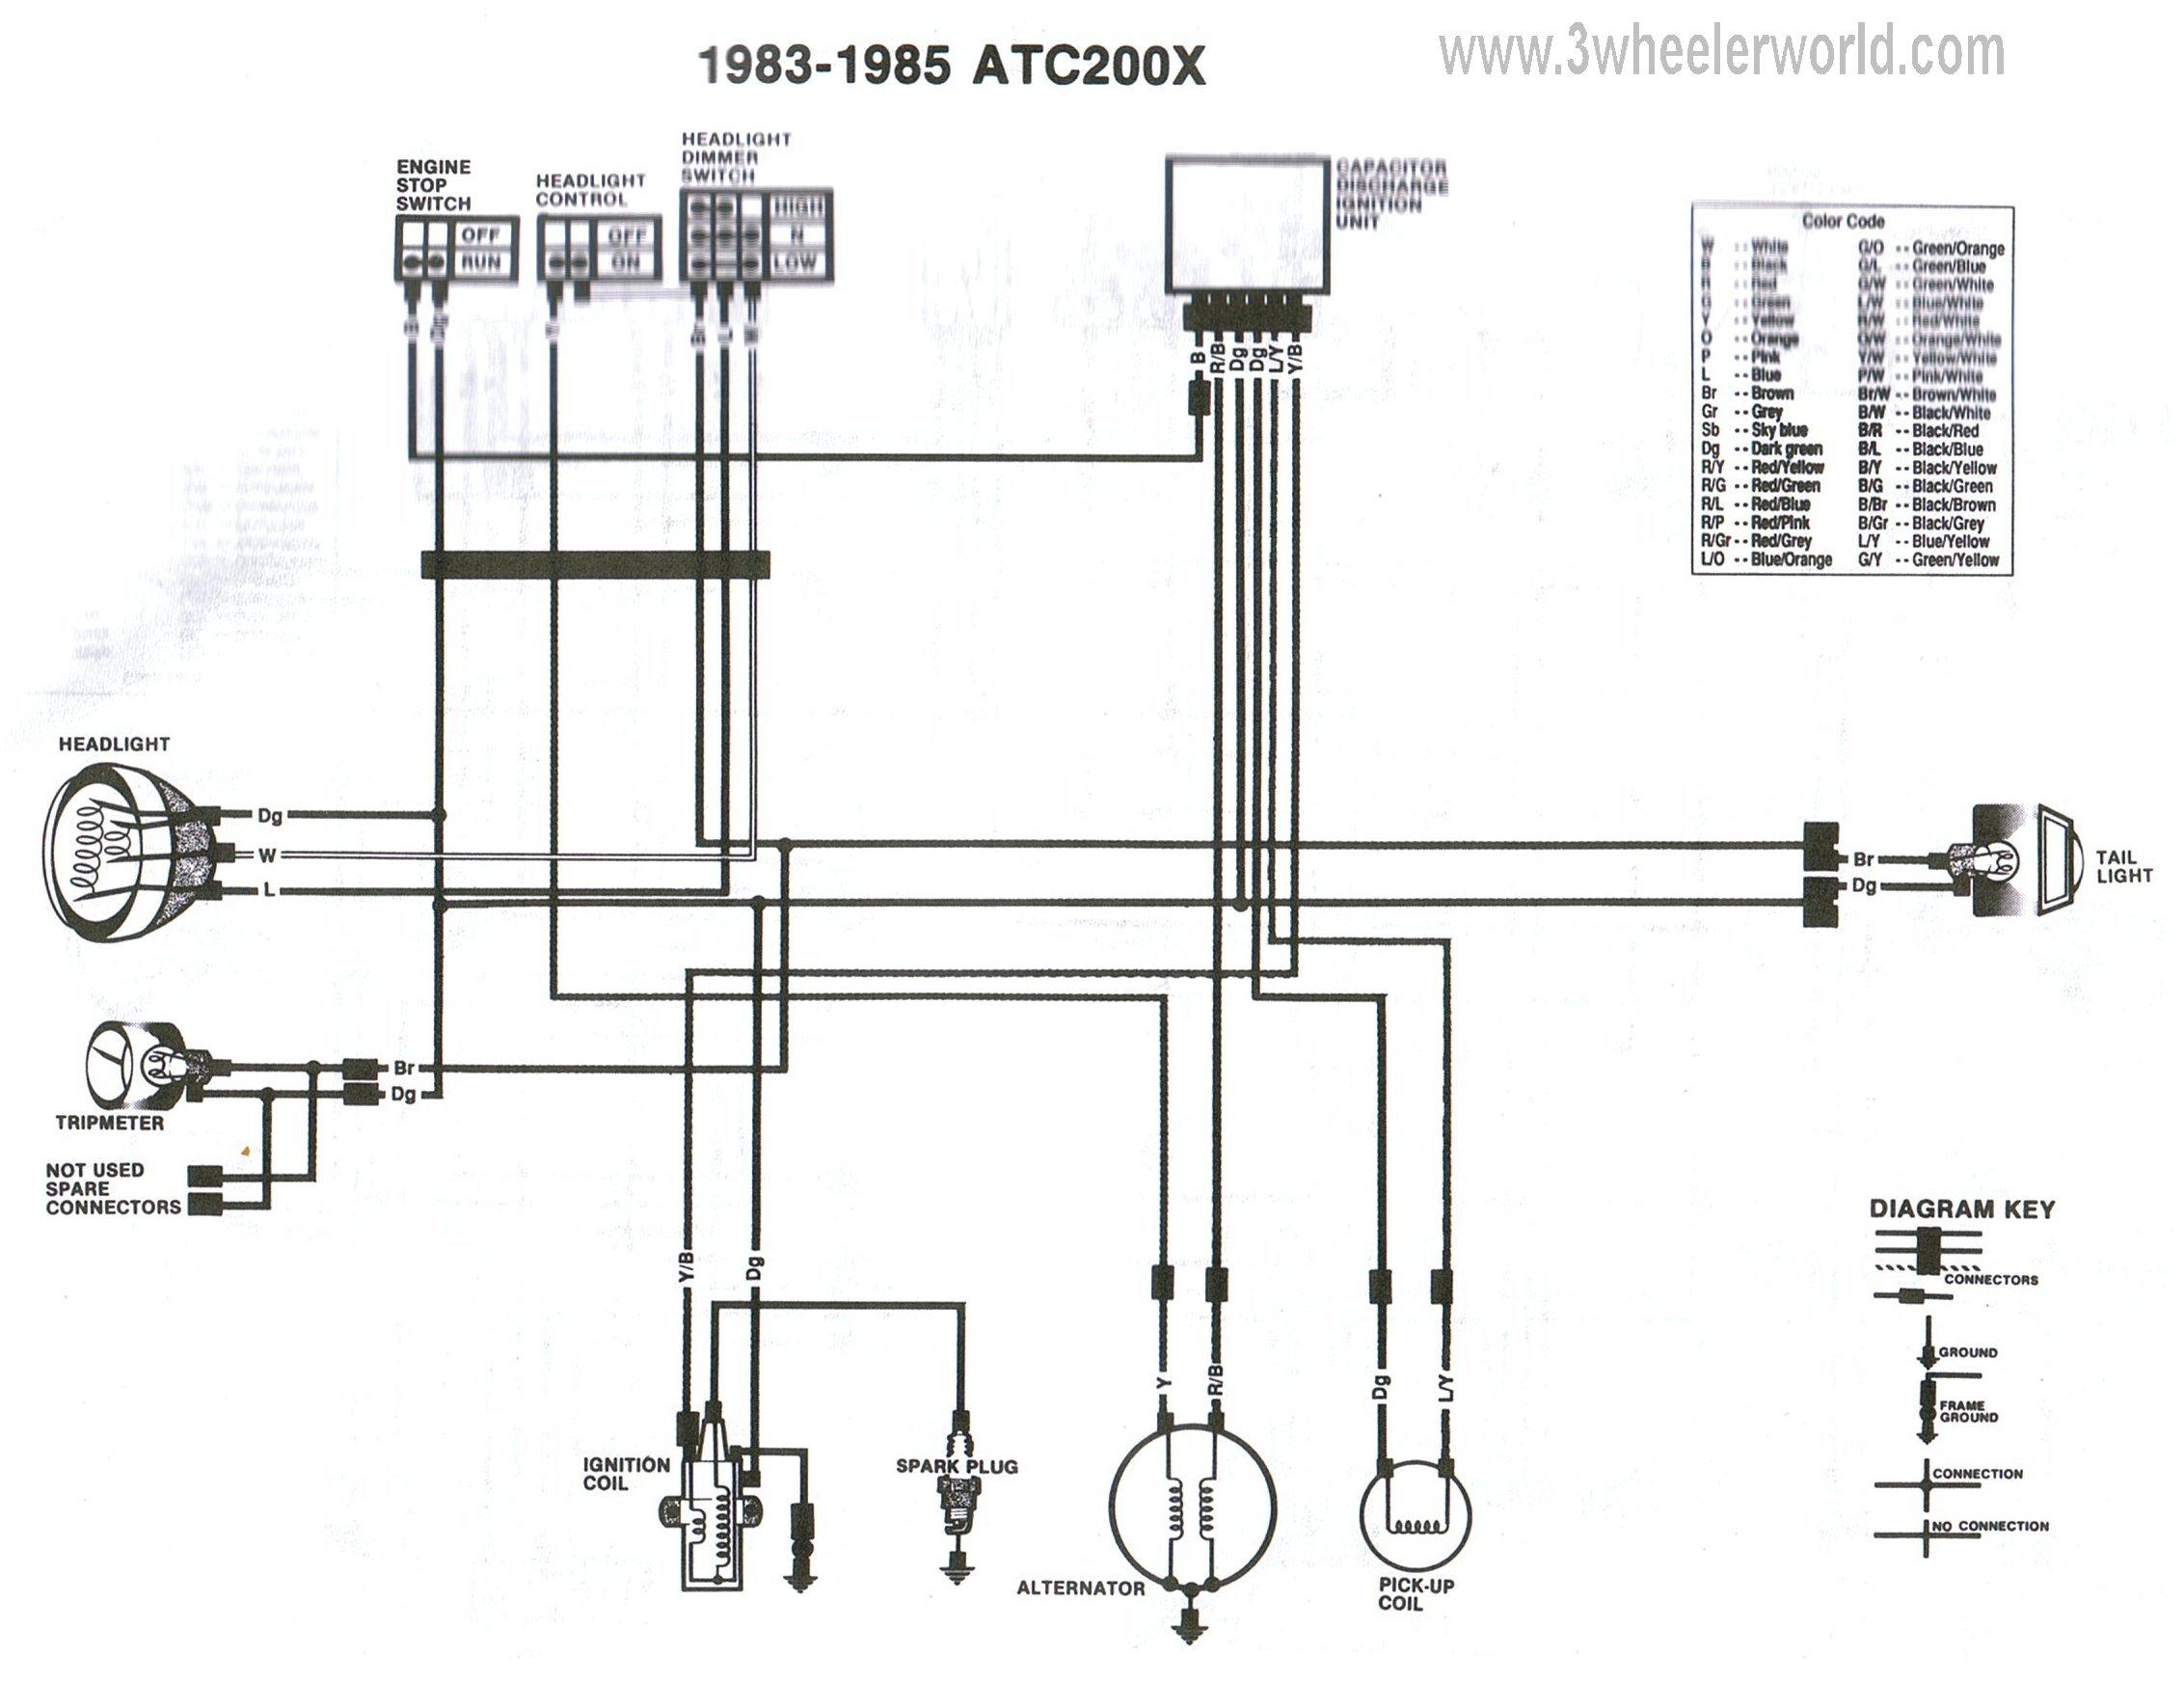 1985 honda 200x wiring diagram